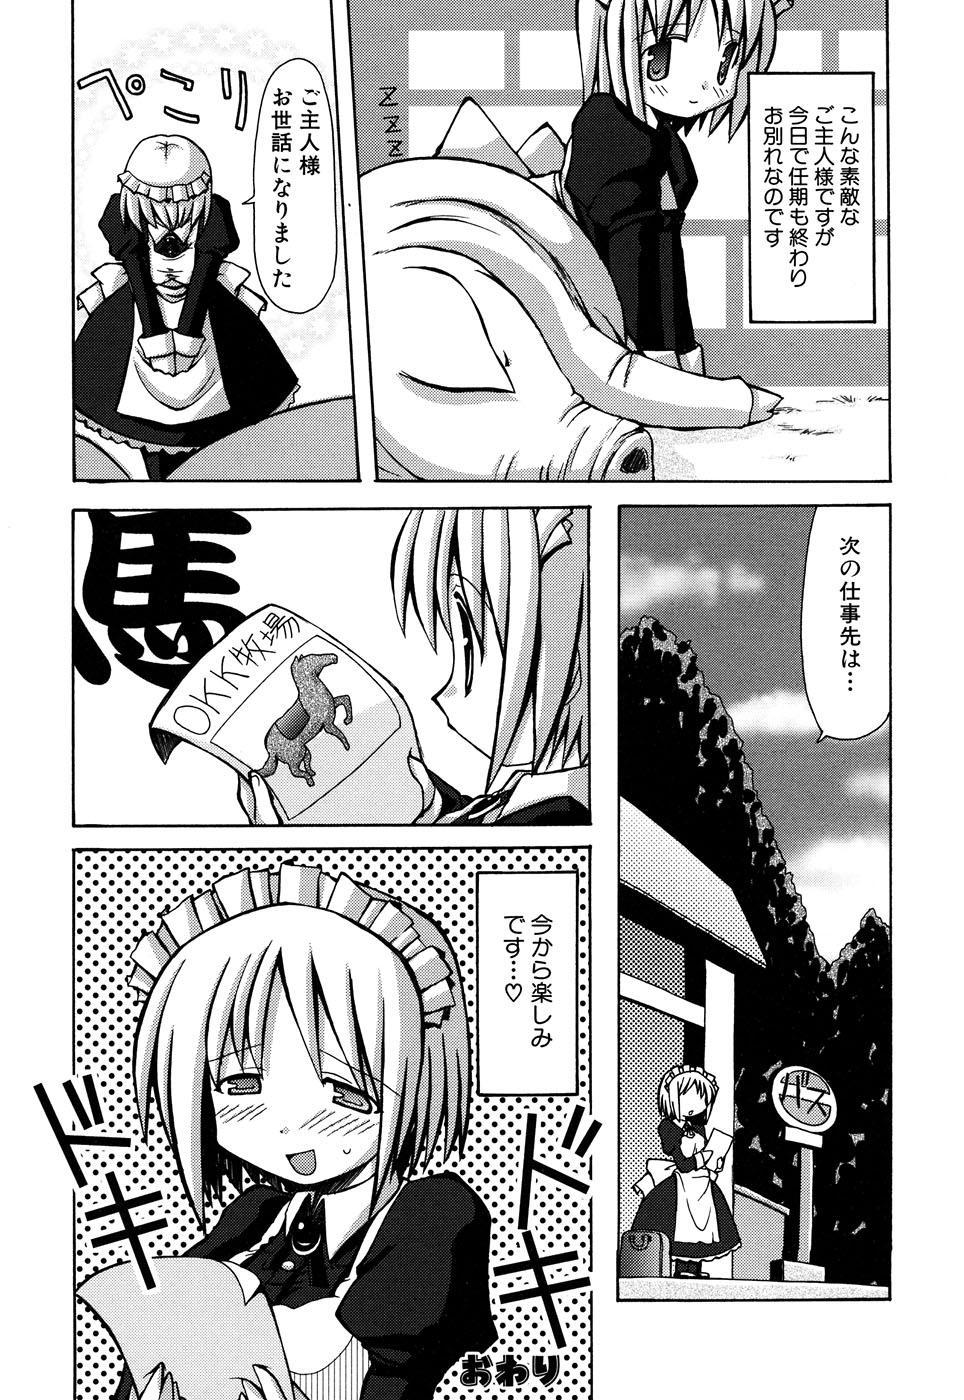 Fechikko VS Series ROUND.2 Miko San VS Maid San 146